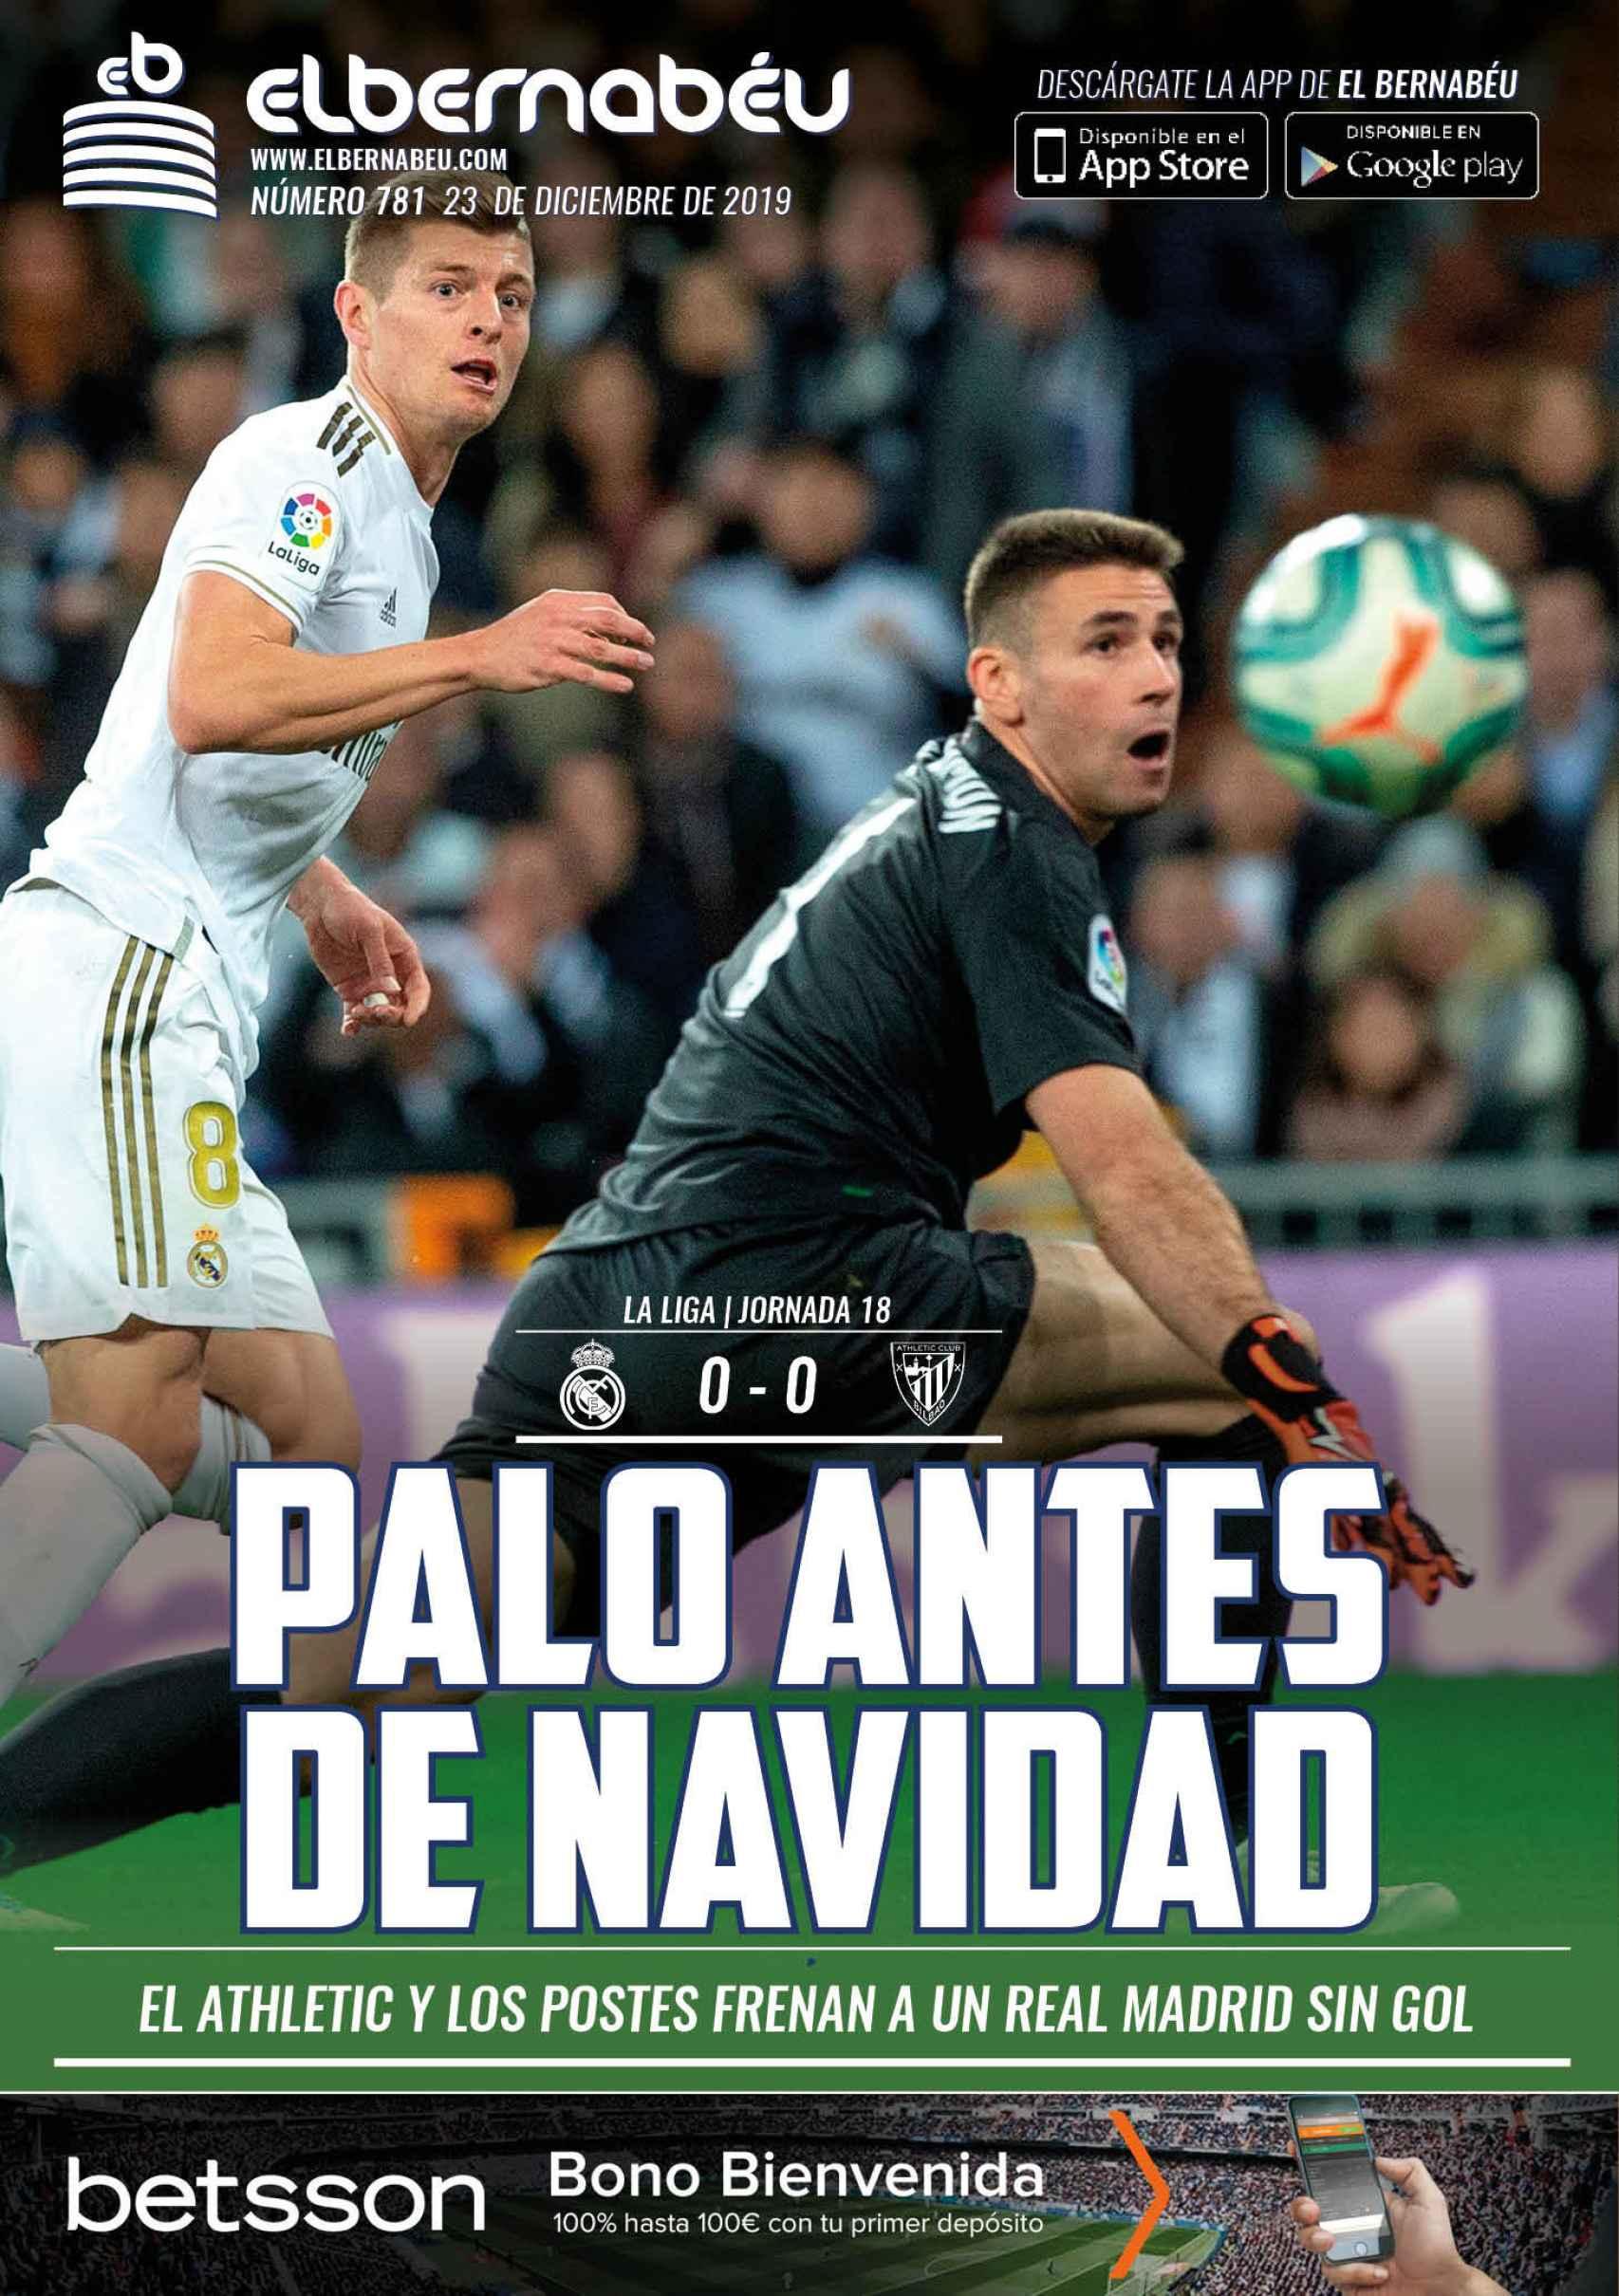 La portada de El Bernabéu (23/12/2019)